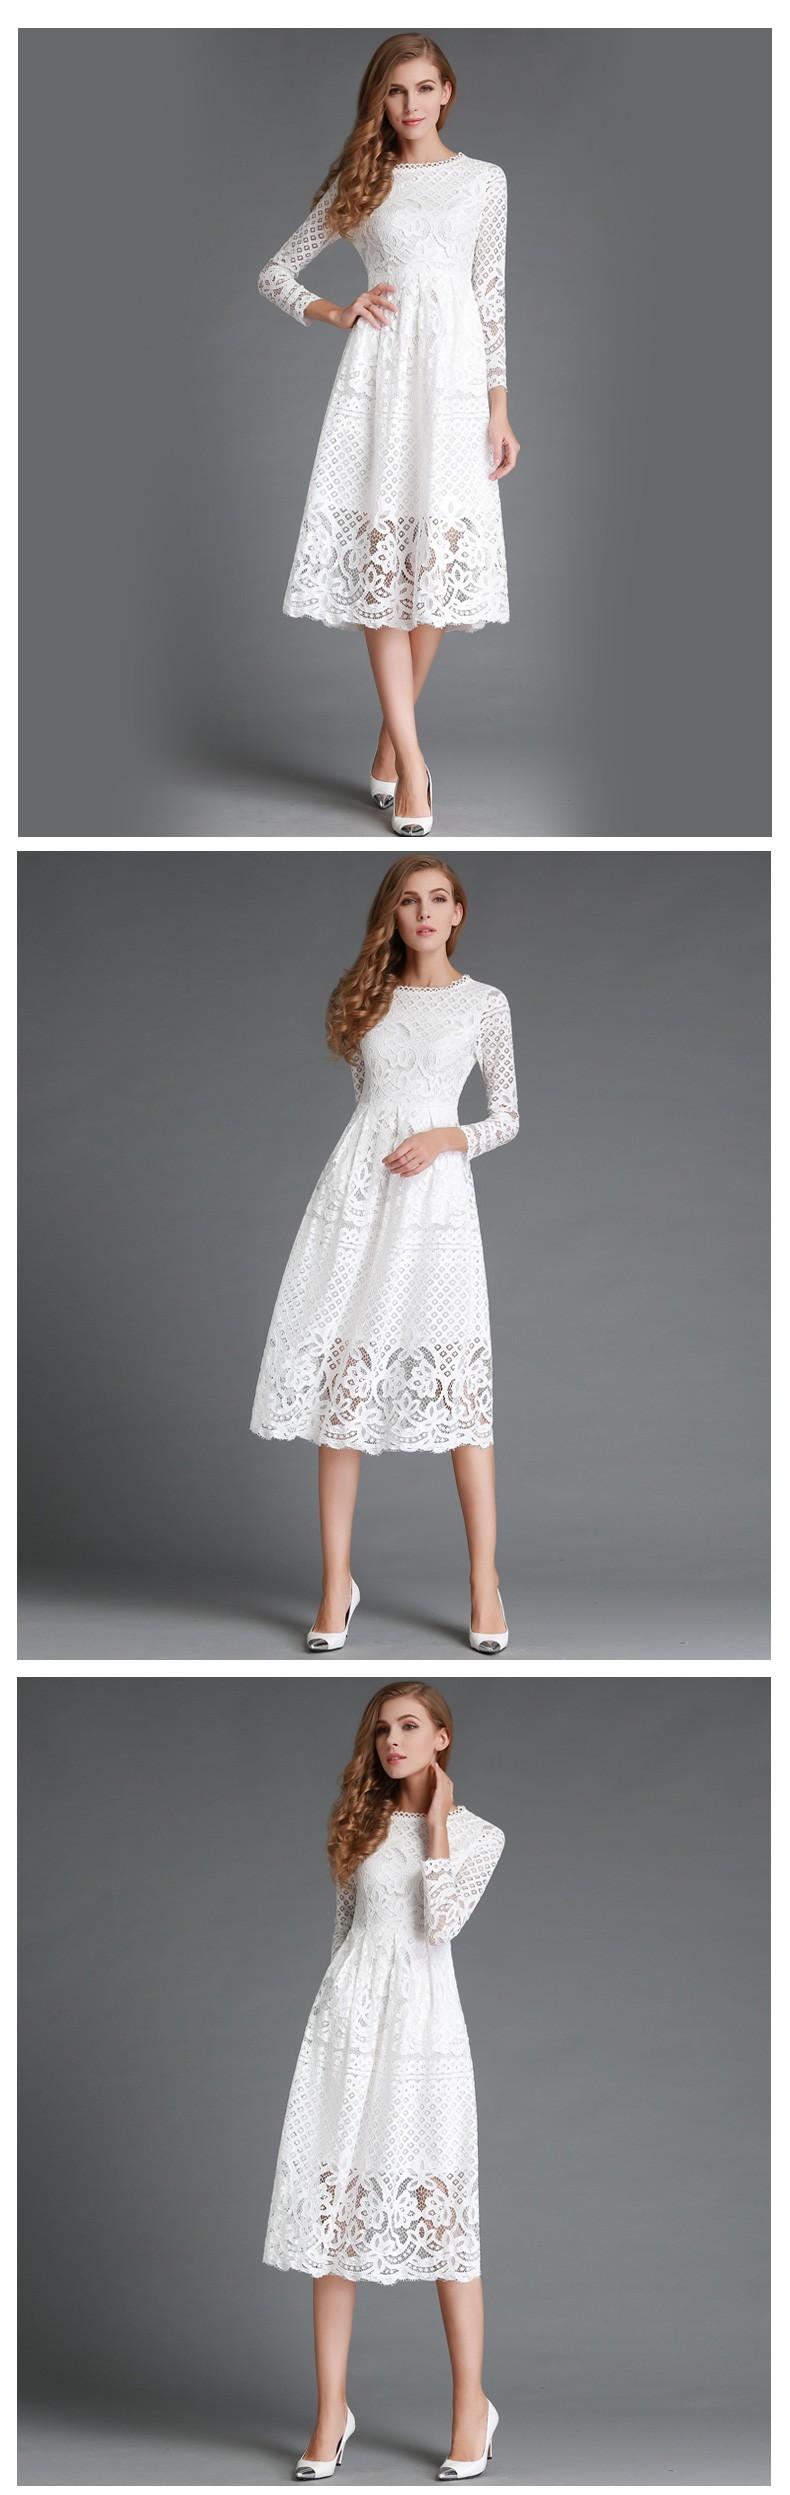 Beauty Long Sleeved Lace Dress 3